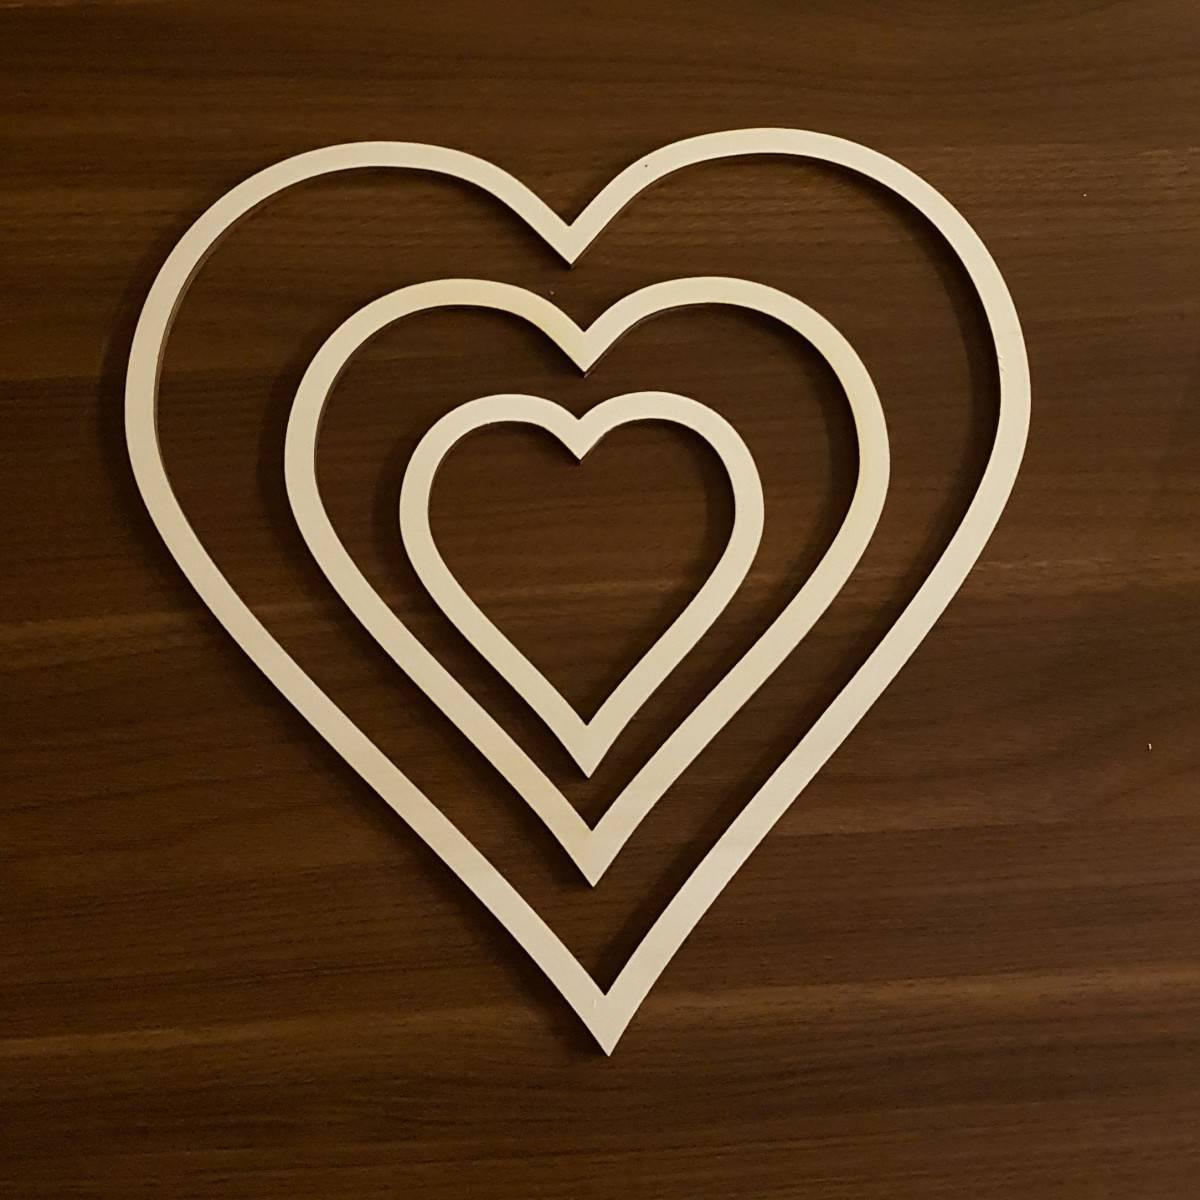 srdce-na-lapac-snov-6mm